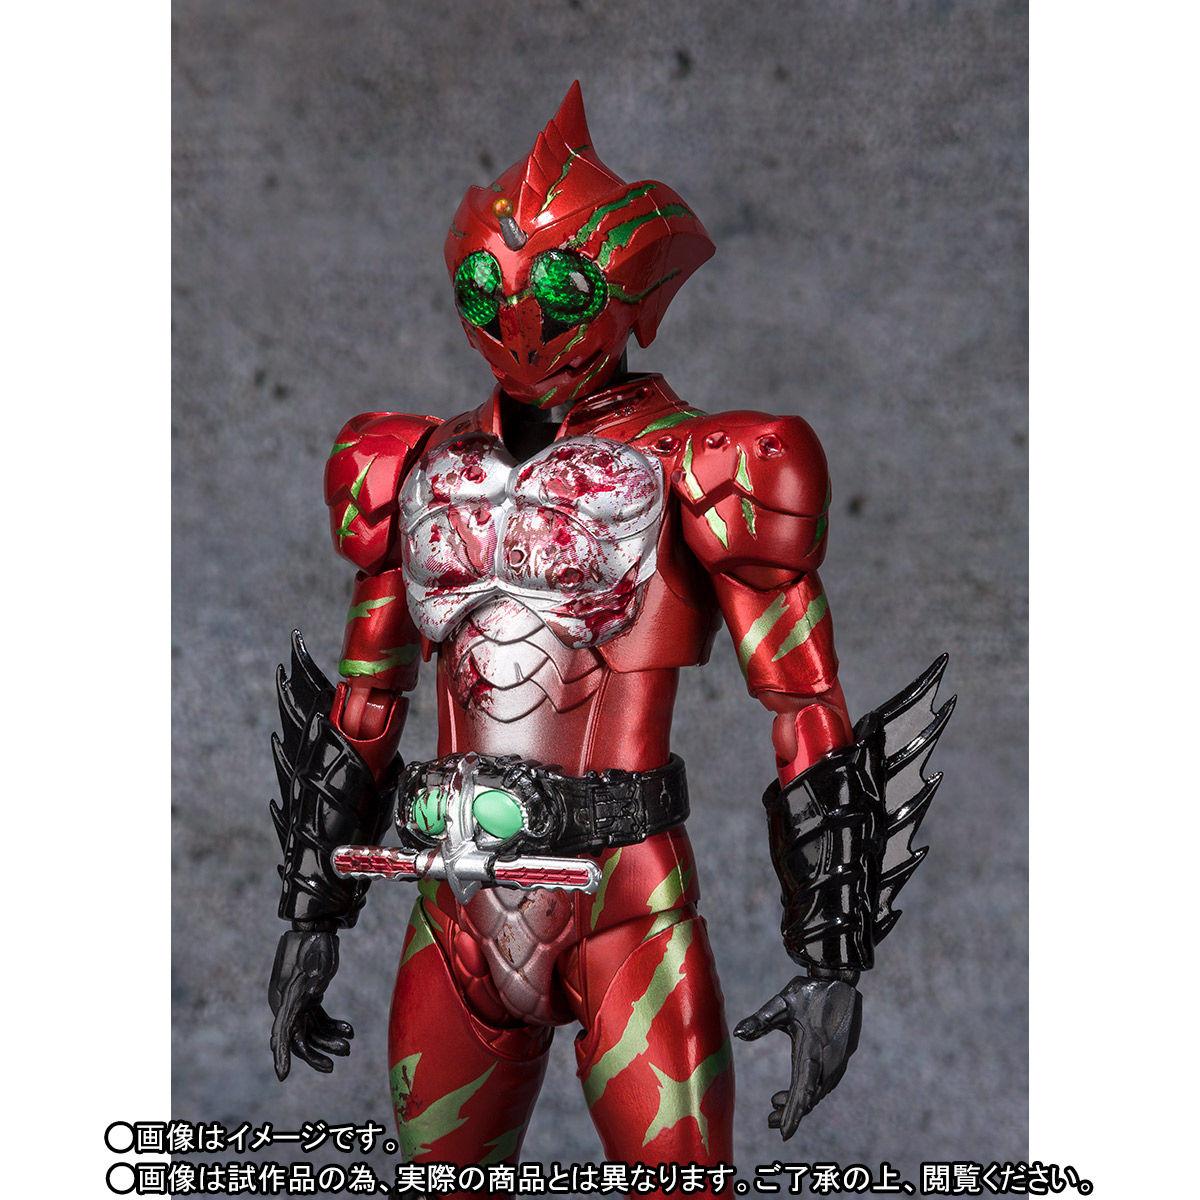 S.H.フィギュアーツ『仮面ライダーアマゾンズ 最後ノ審判セット』可動フィギュア-004